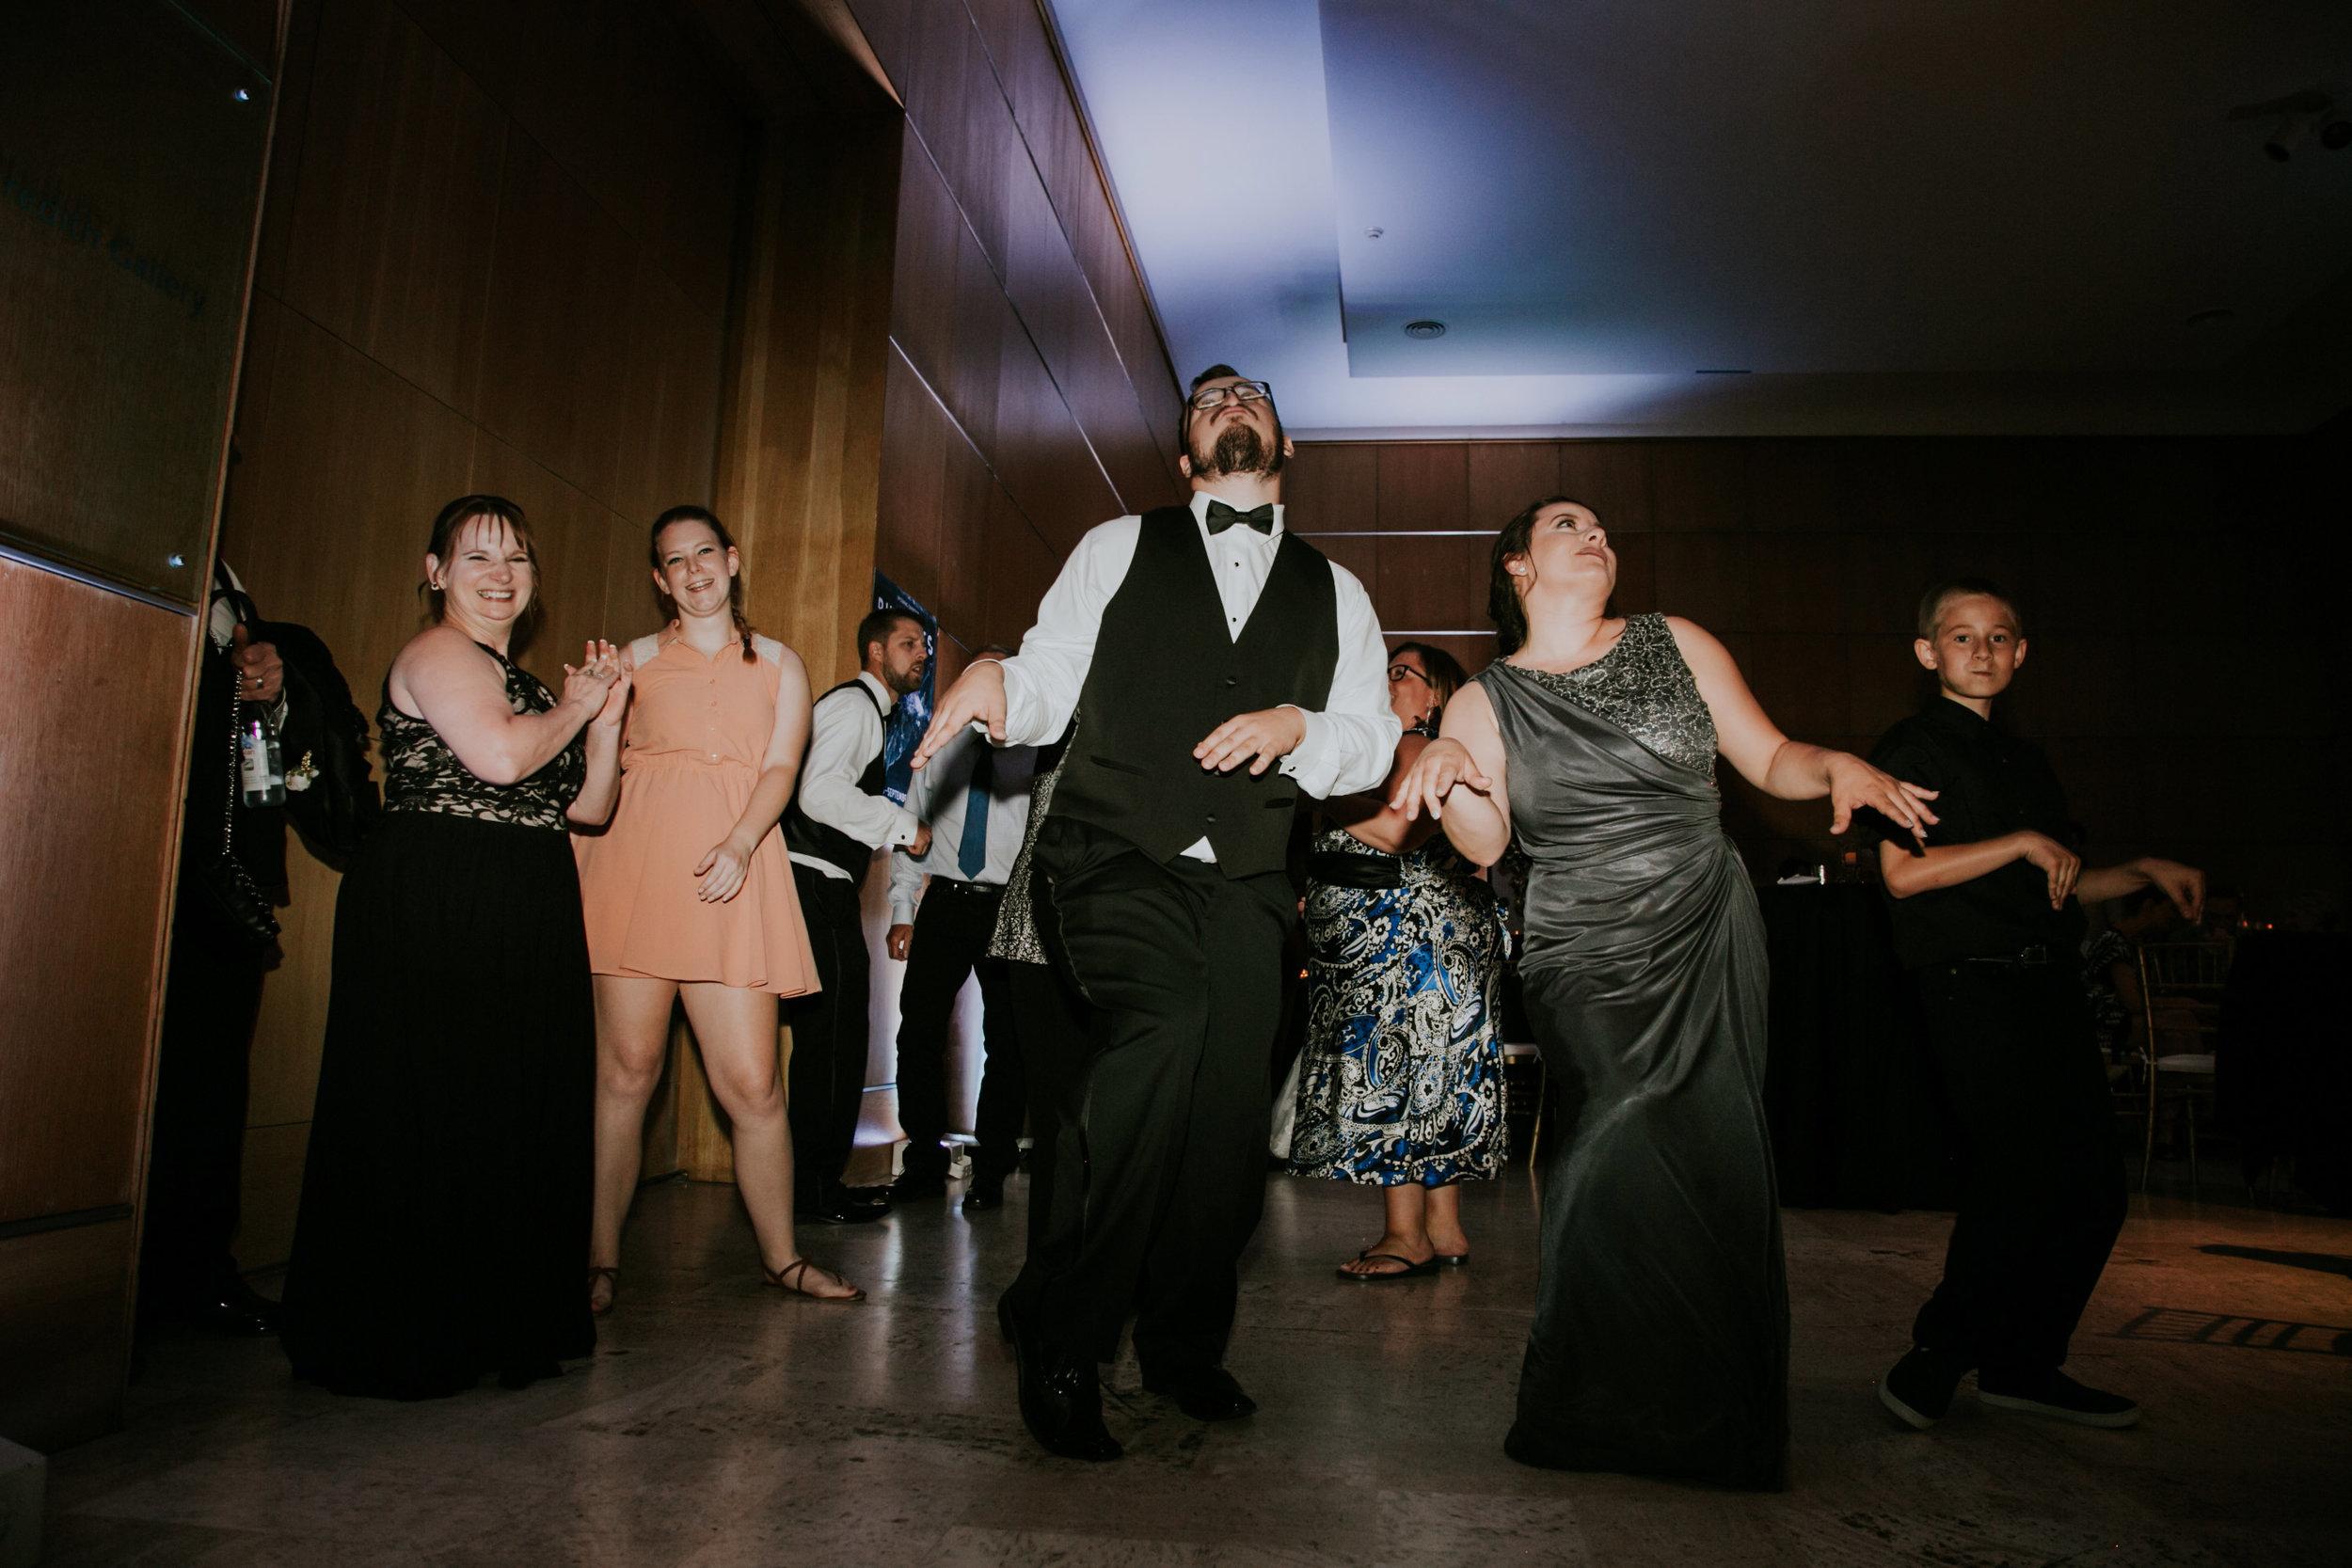 guest-dancing-to-thriller-desmoines-iowa-art-center-raelyn-ramey-photography.jpg